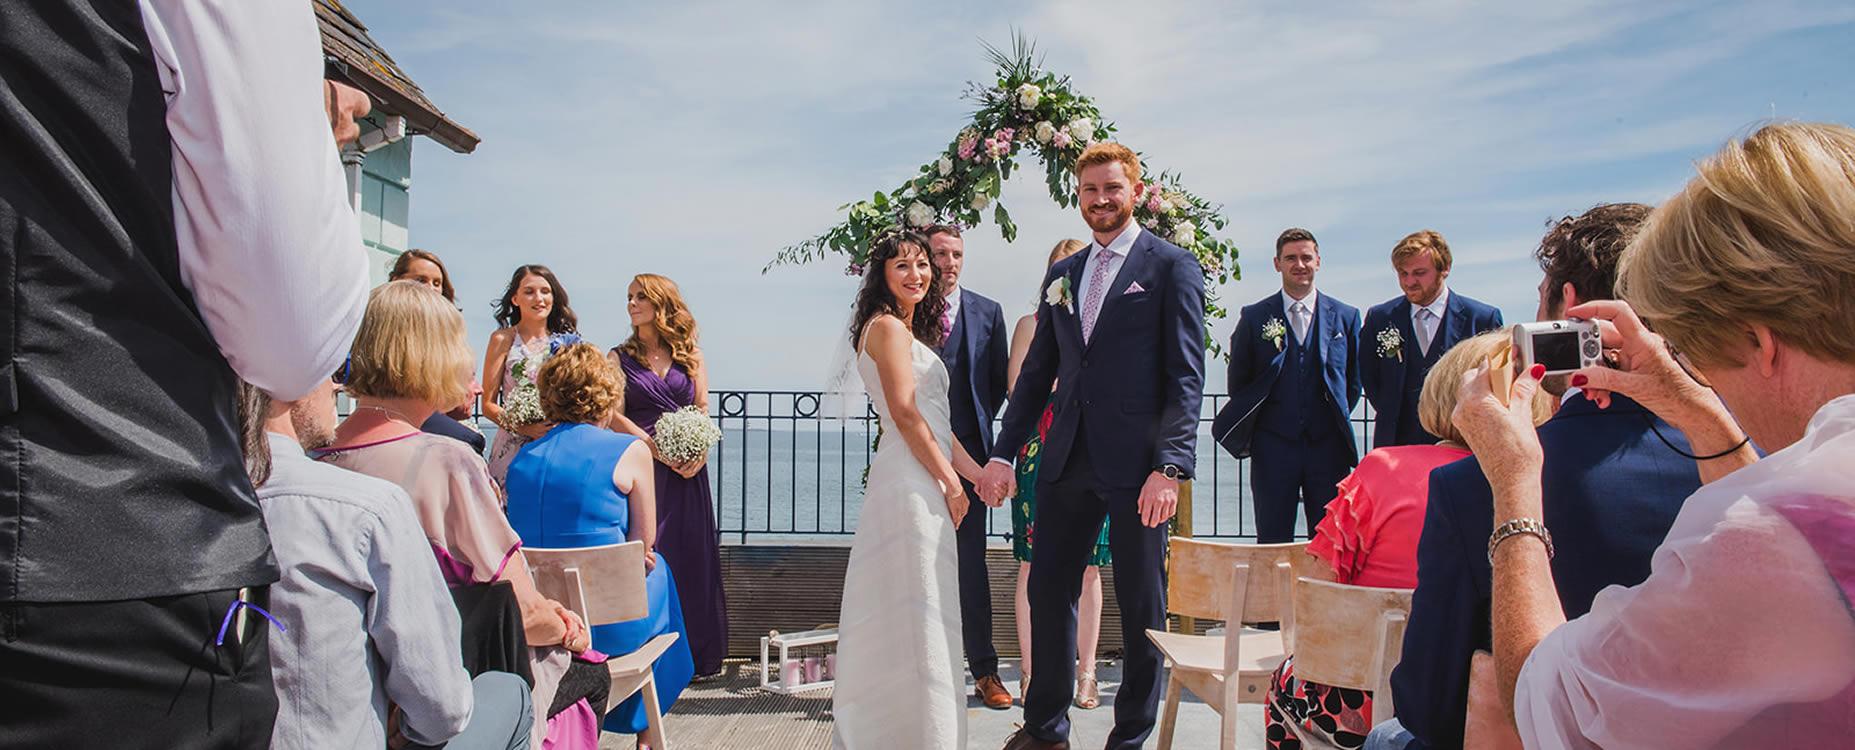 weddings-slider1